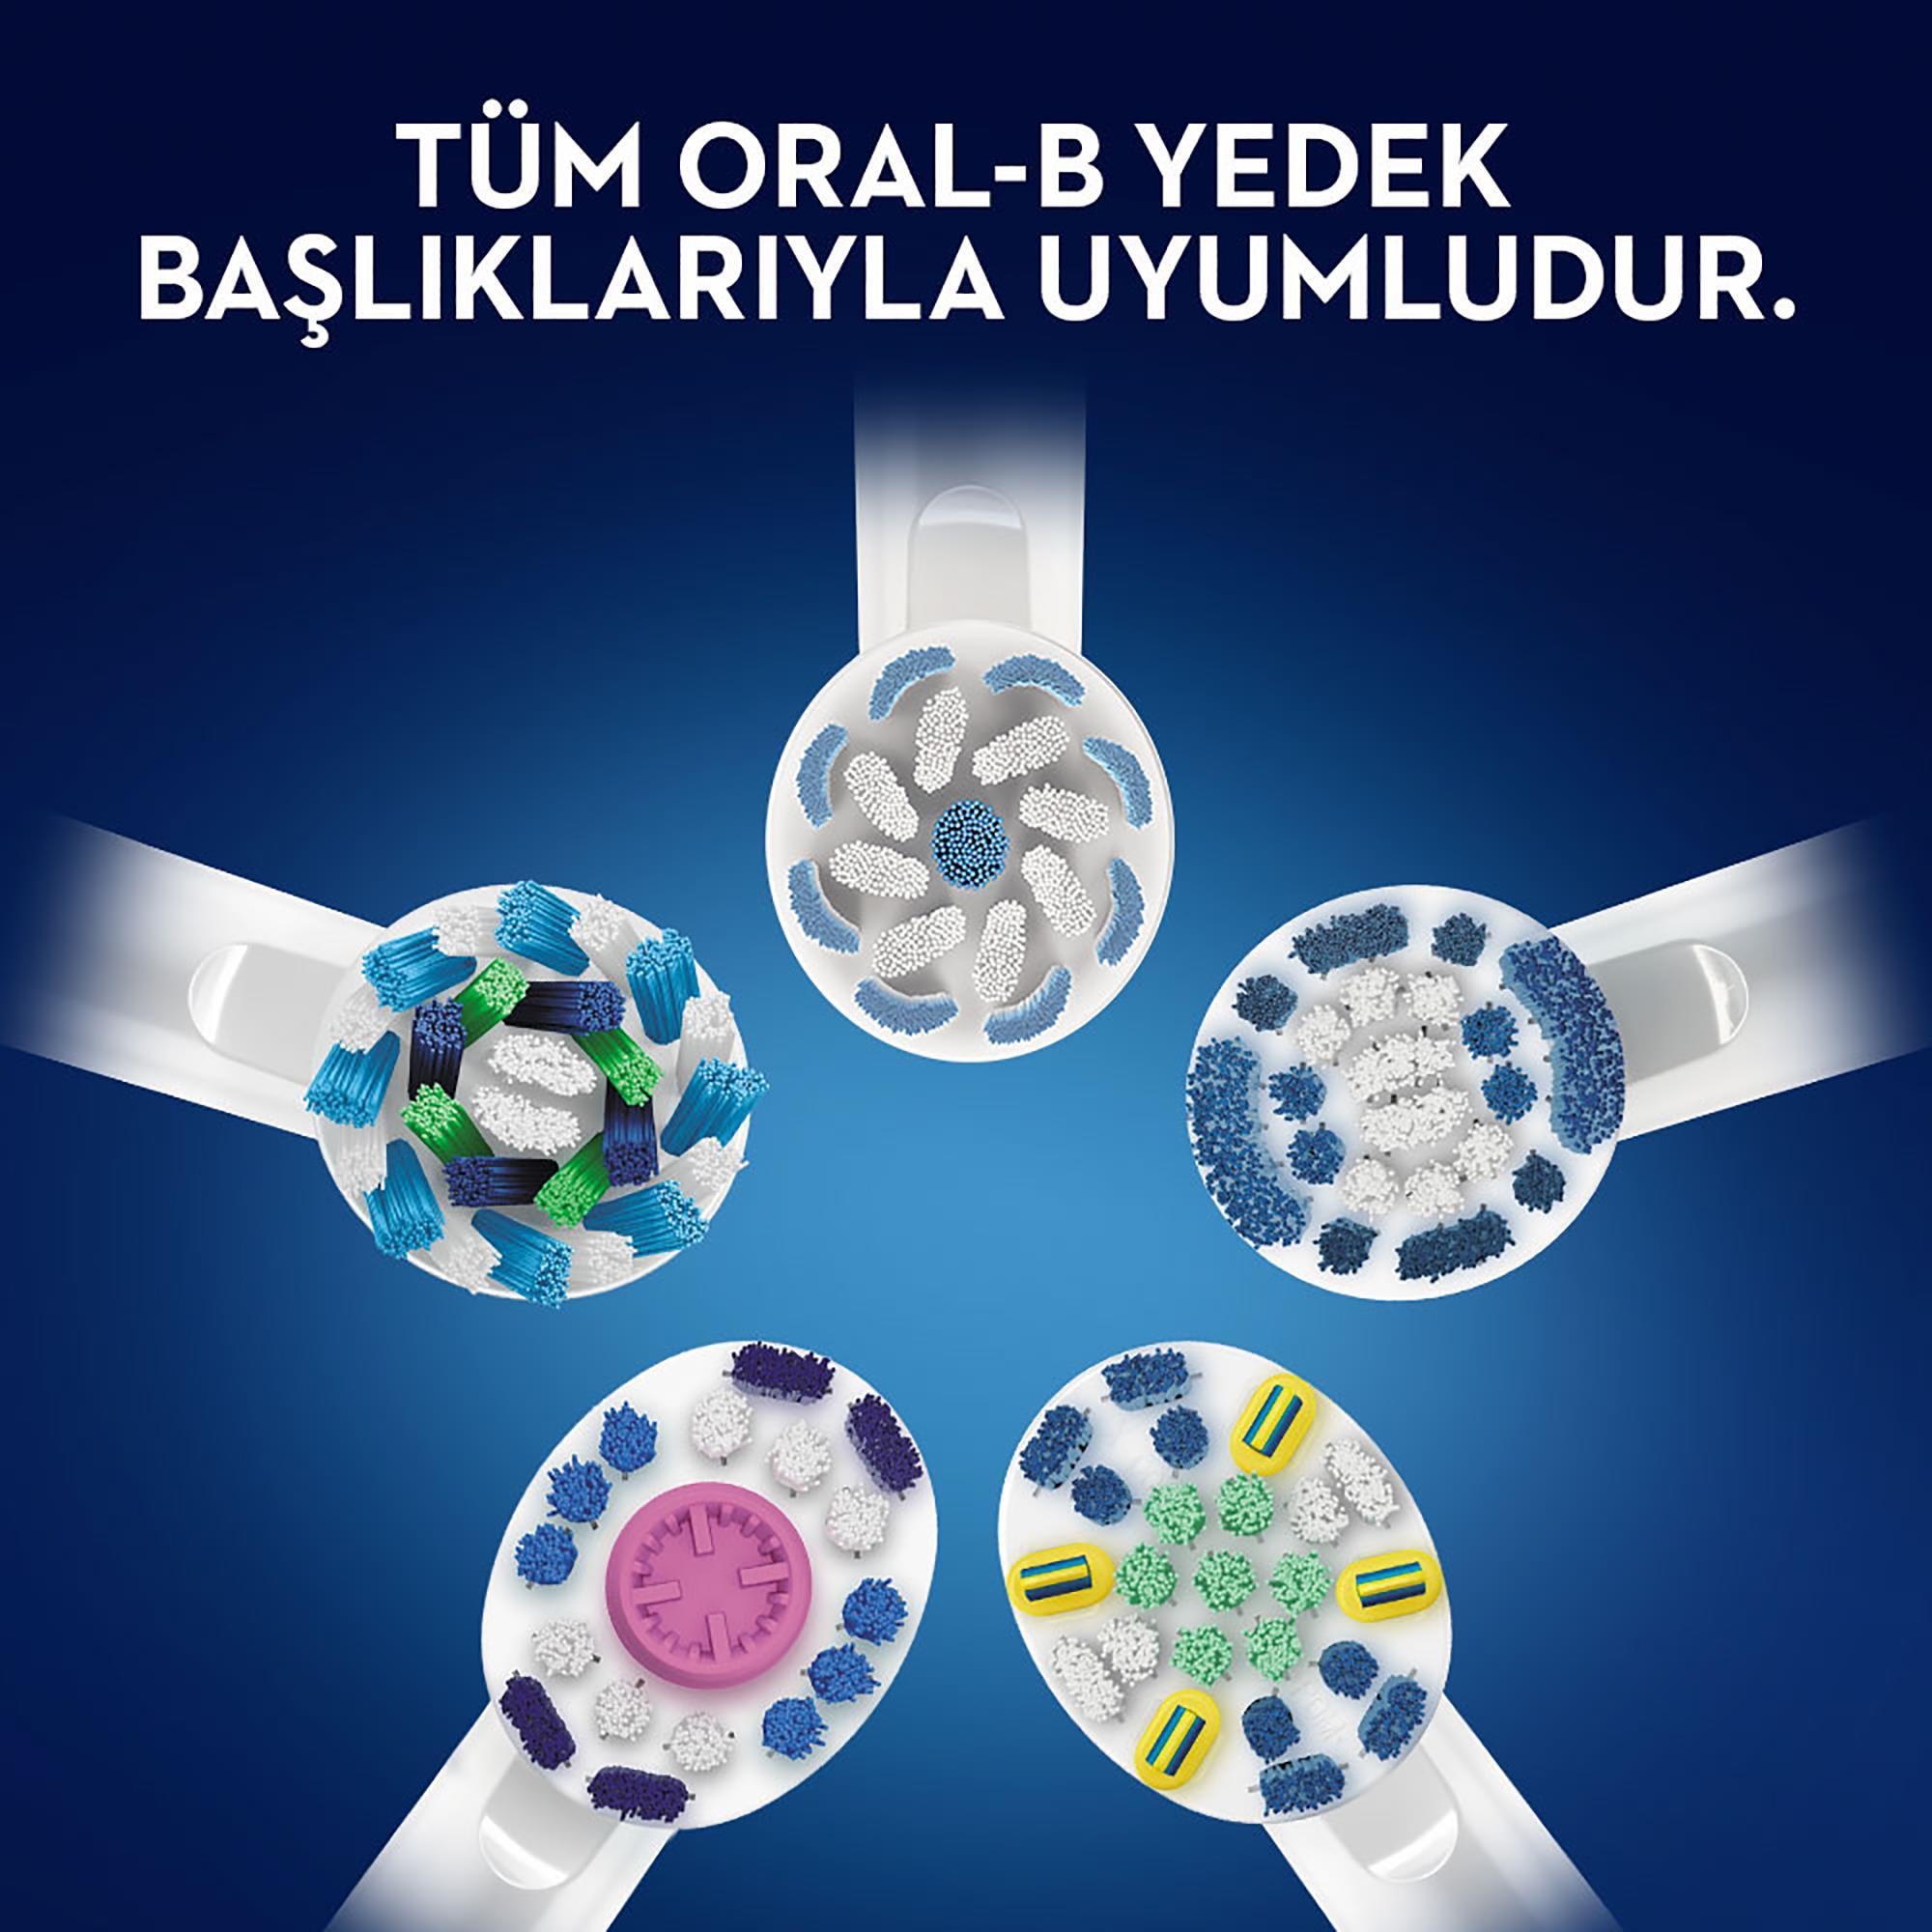 Oral-B Vitality D100 Beşiktaş Serisi Şarjlı Diş Fırçası - Thumbnail